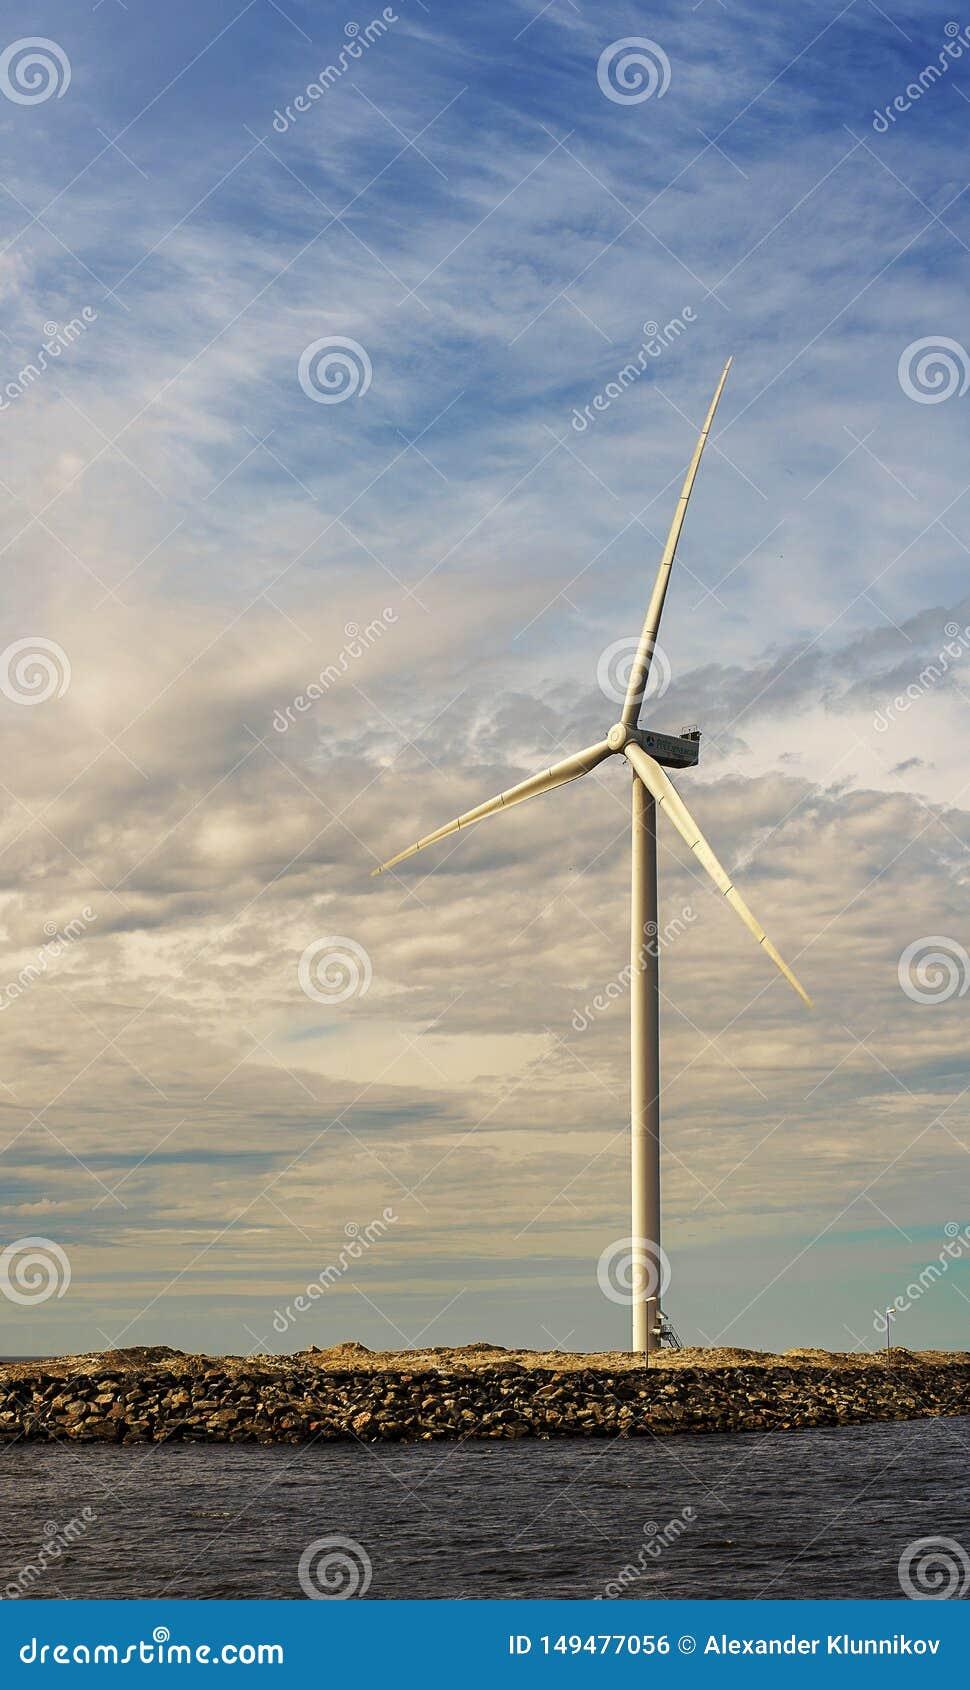 Parco eolico alto bianco sui precedenti del cielo vicino al mare Bothnia del nord